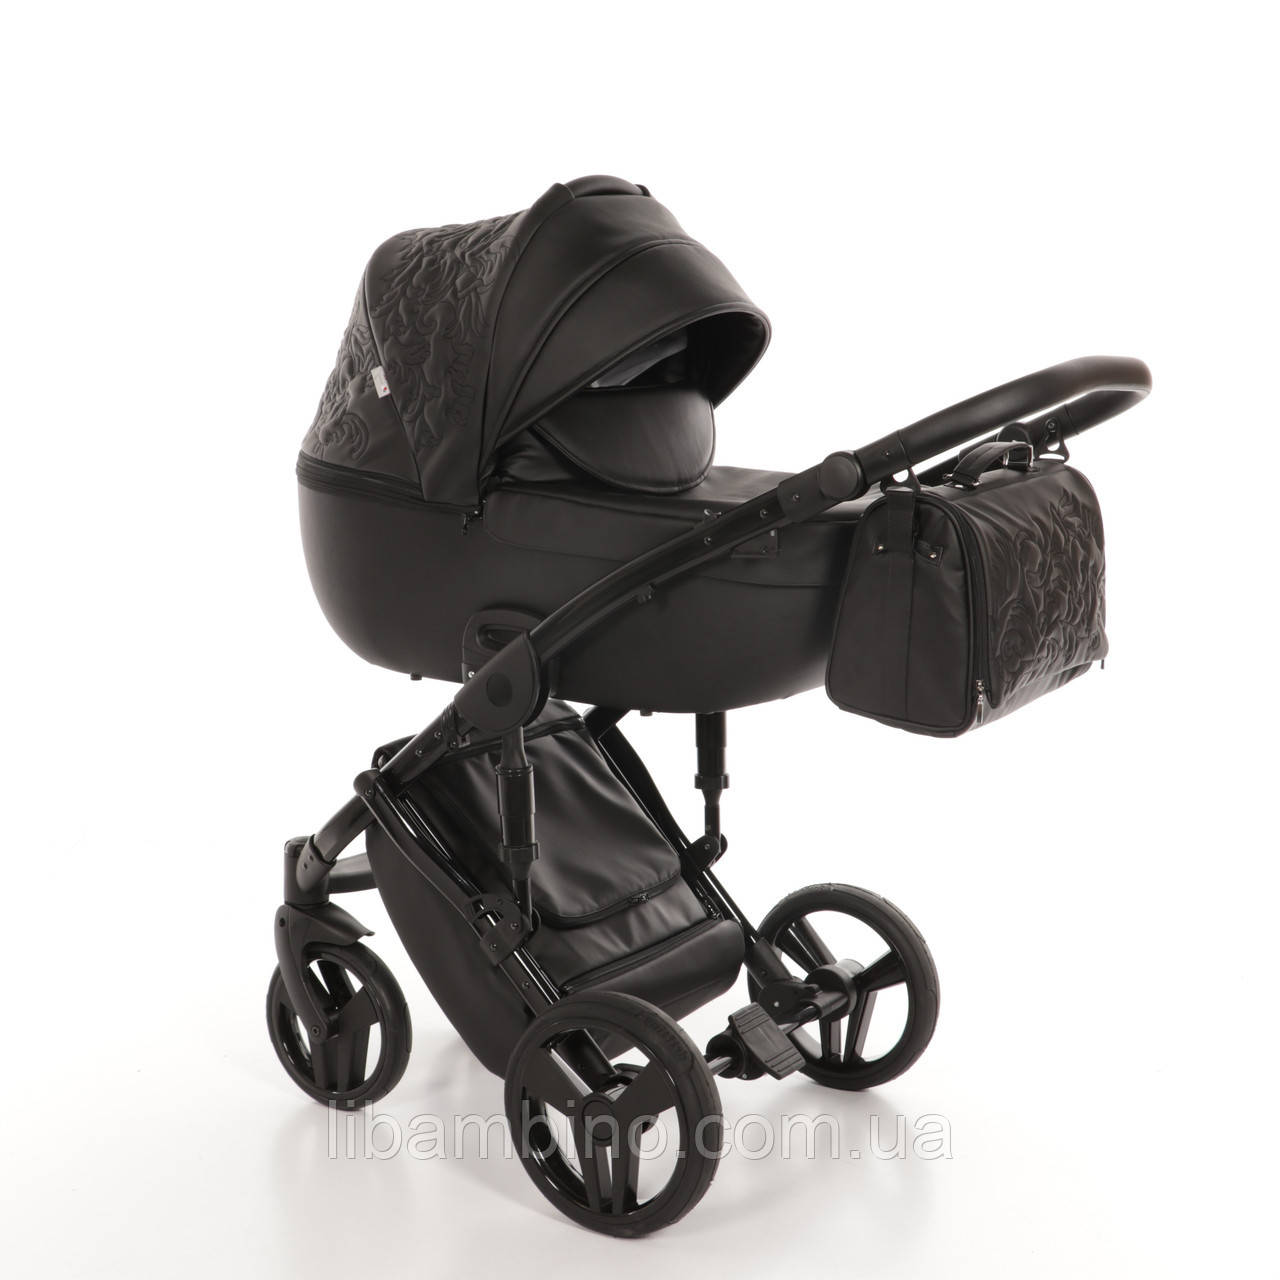 Дитяча універсальна коляска 2 в 1 Junama Enzo 04